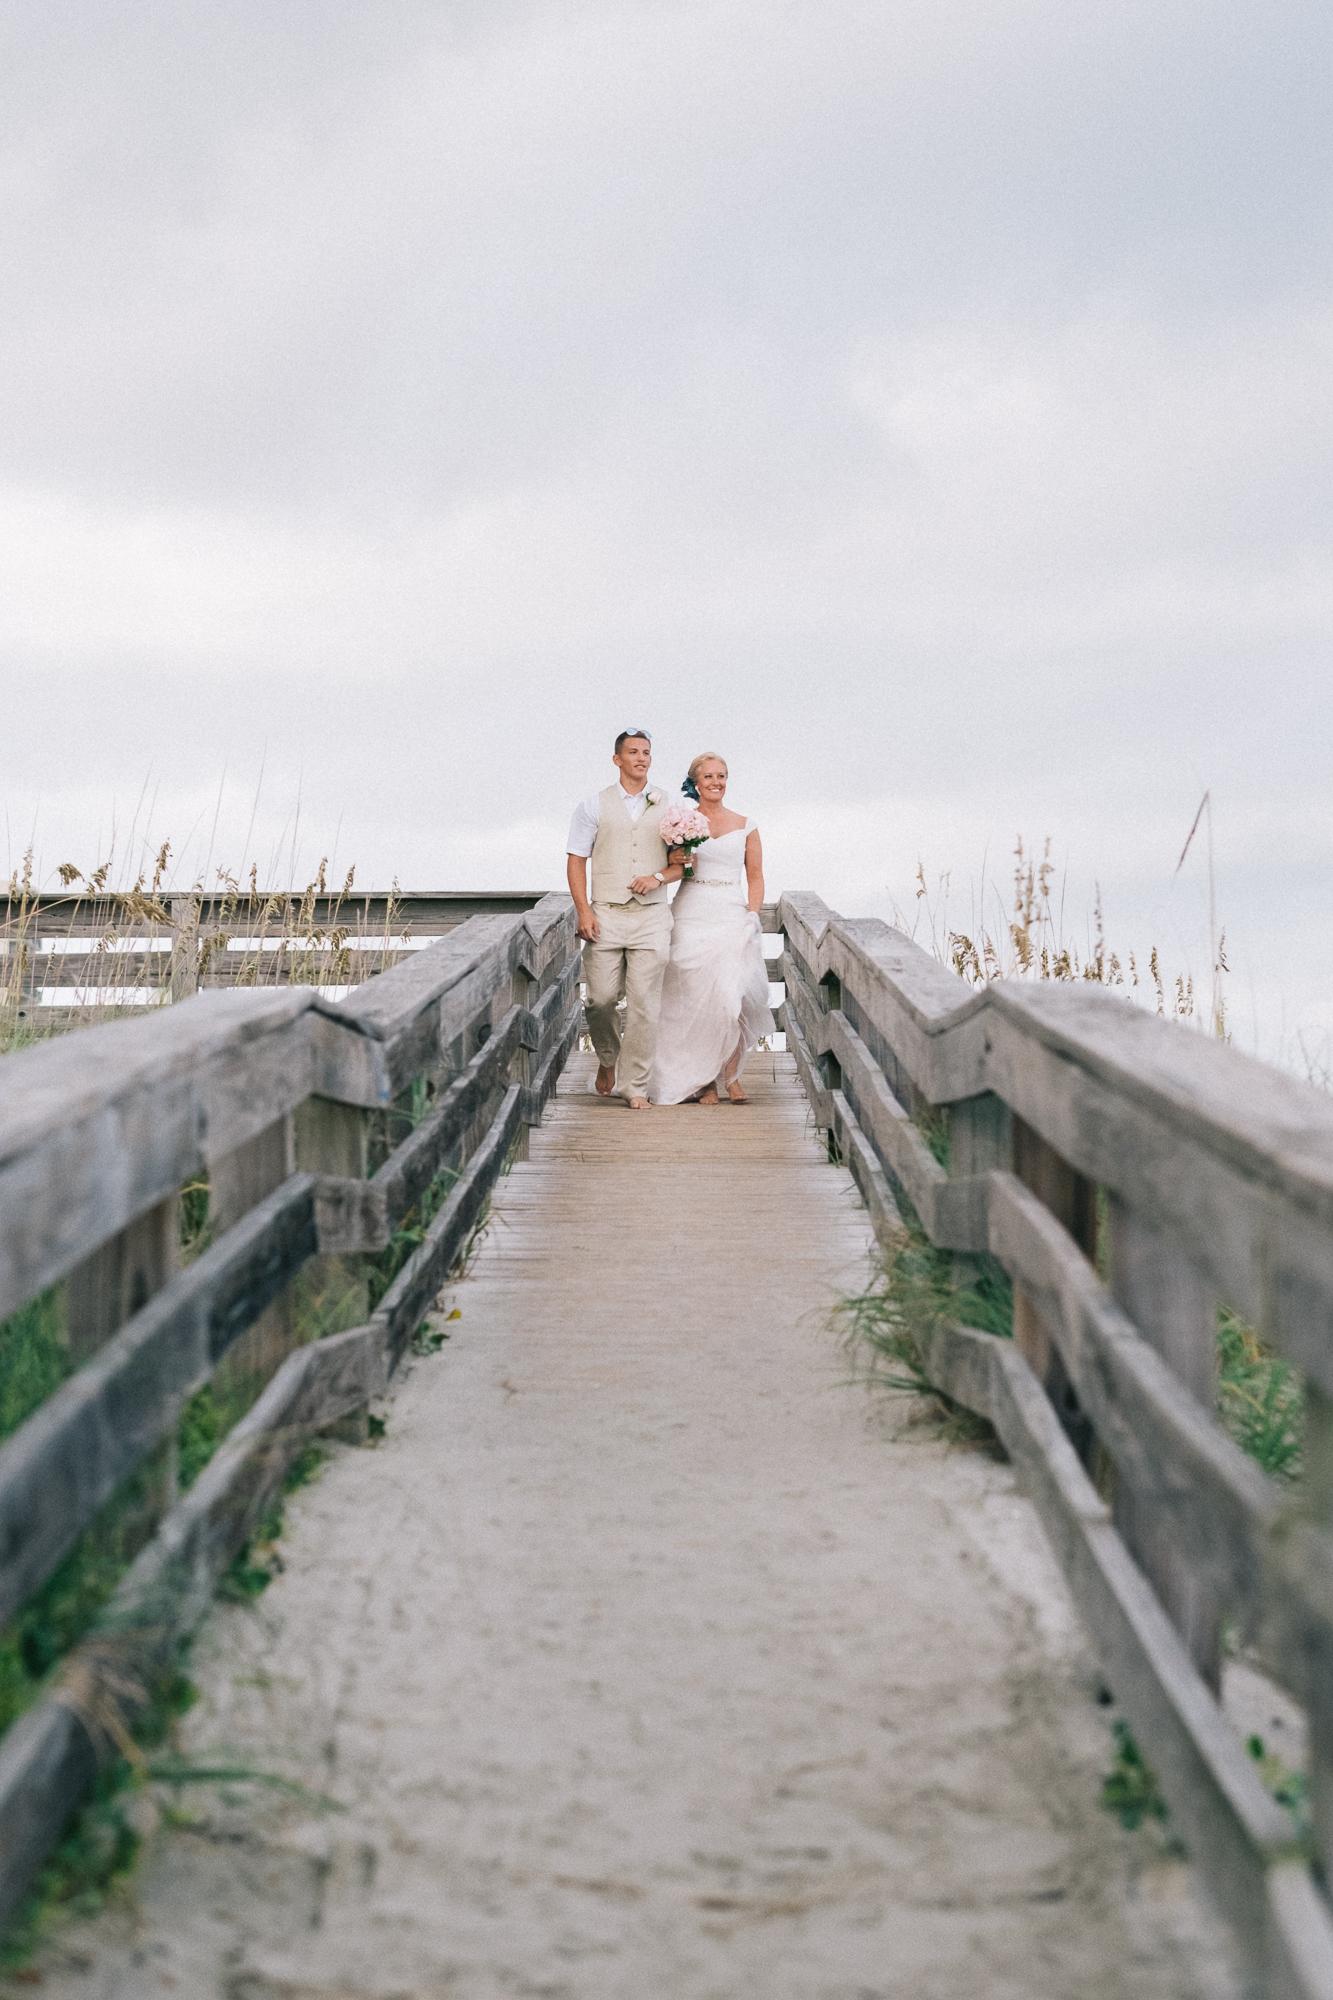 Stephanie-Mike-wedding-blog-6.jpg